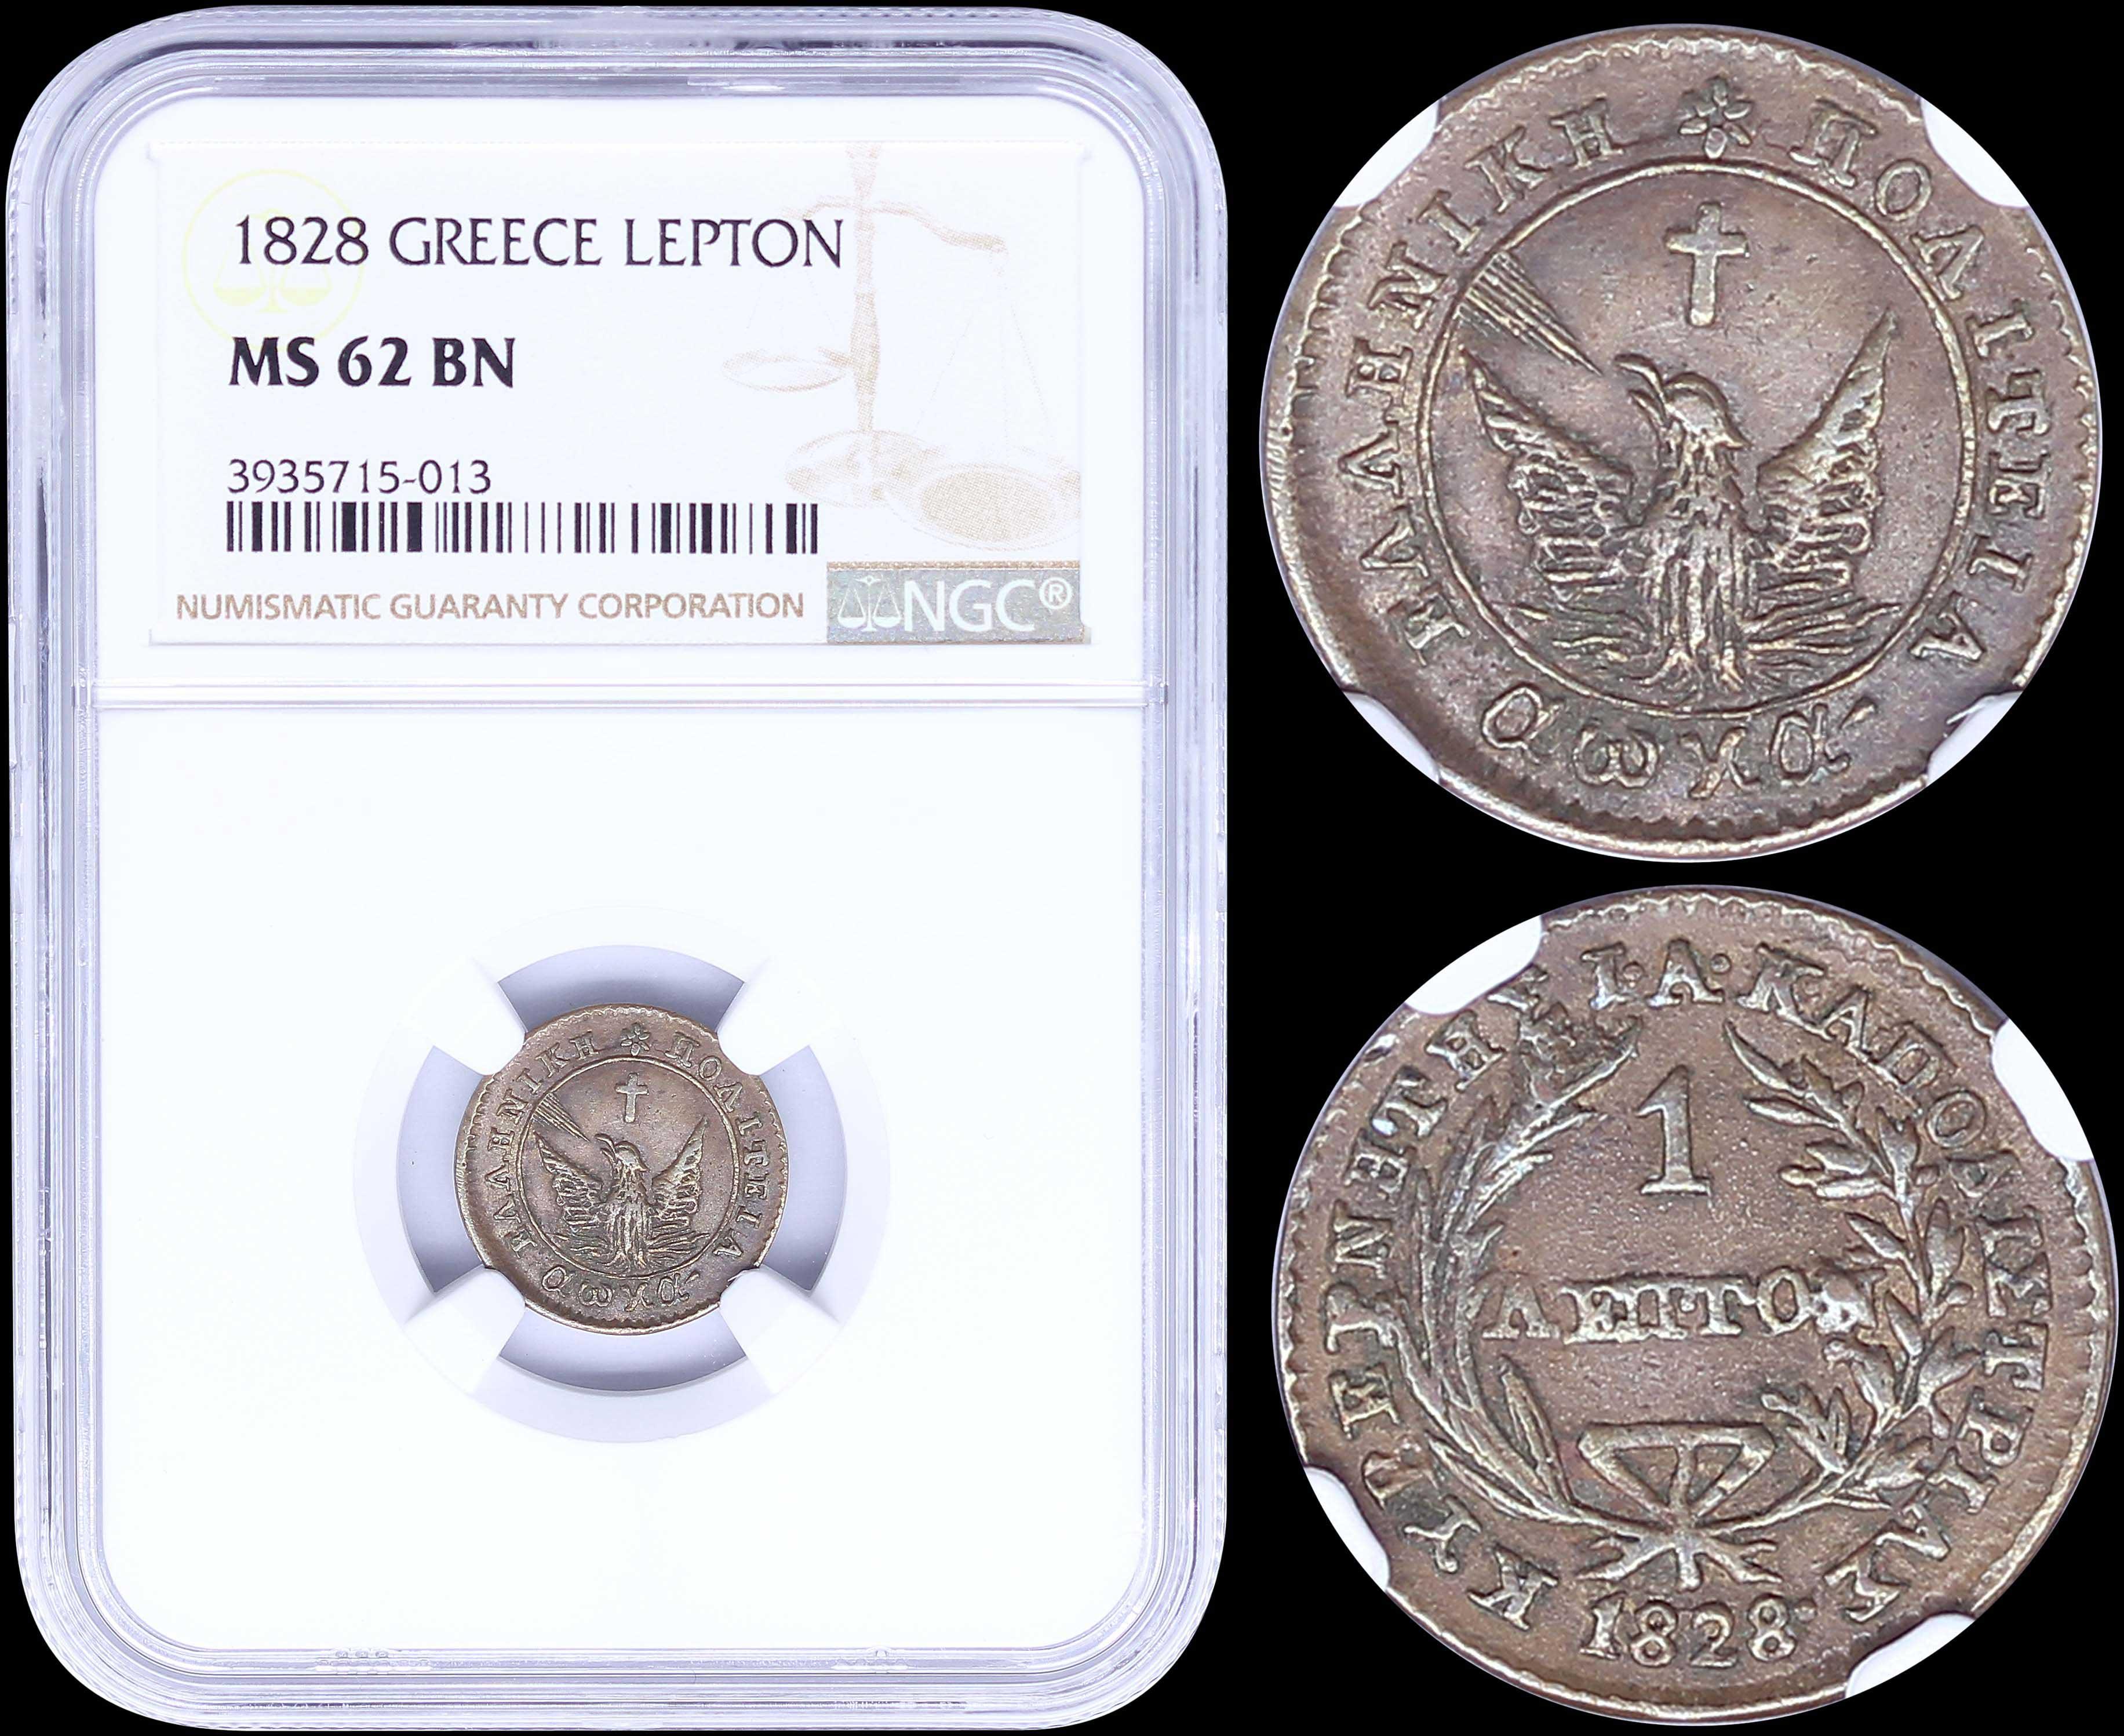 Lot 6007 - -  COINS & TOKENS governor capodistrias -  A. Karamitsos Public & Live Bid Auction 636 Coins, Medals & Banknotes